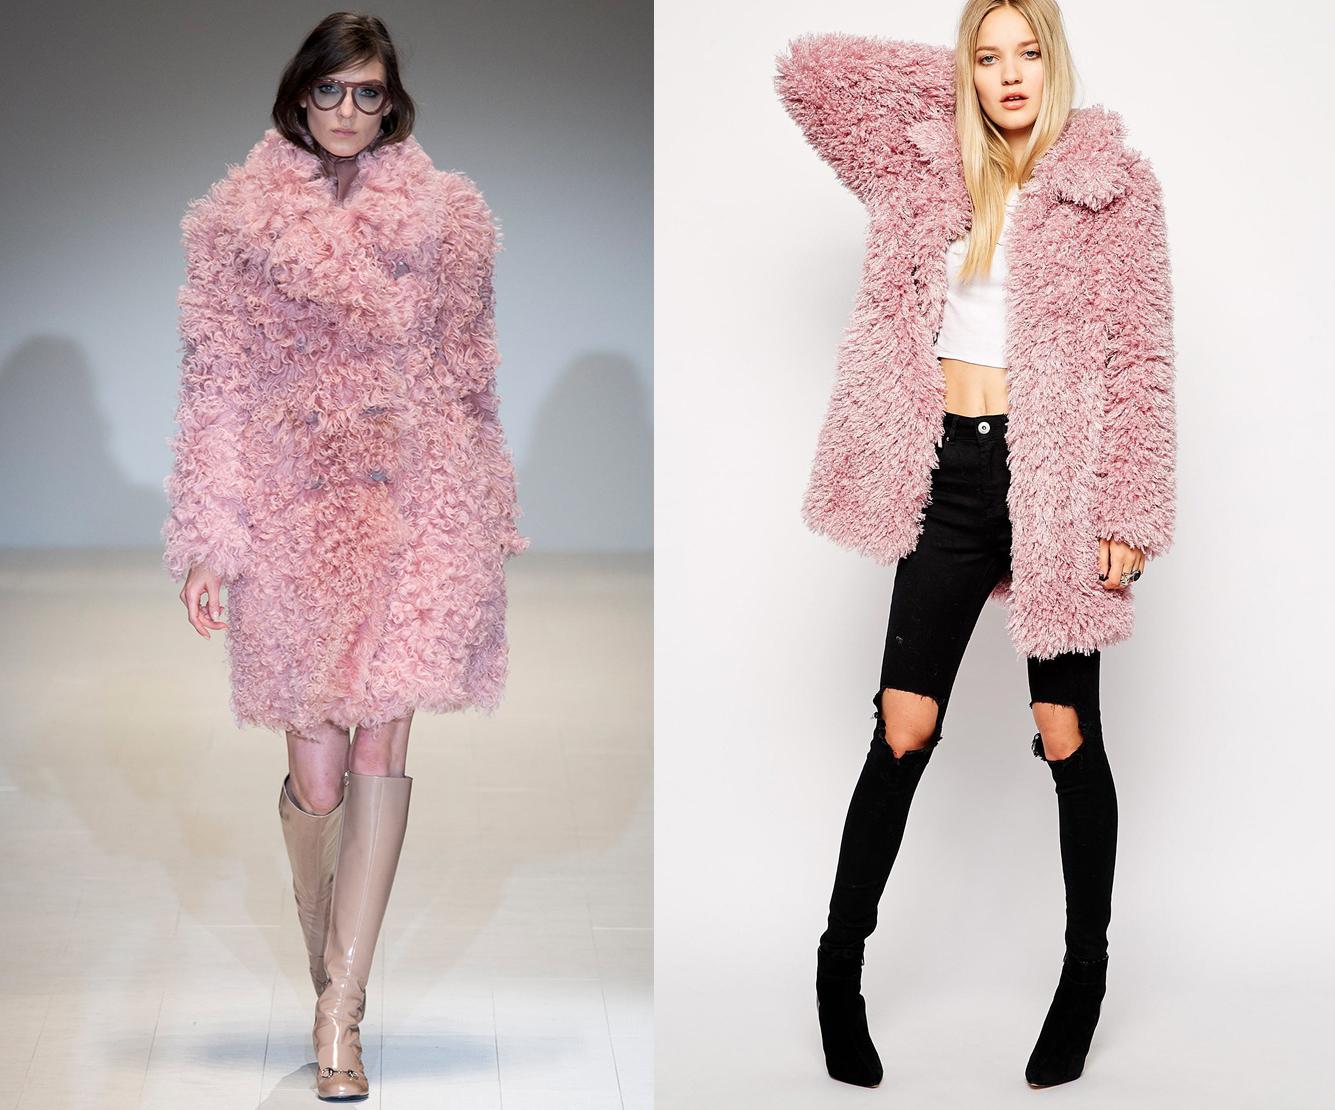 Куртка из овчины Gucci - фото №1